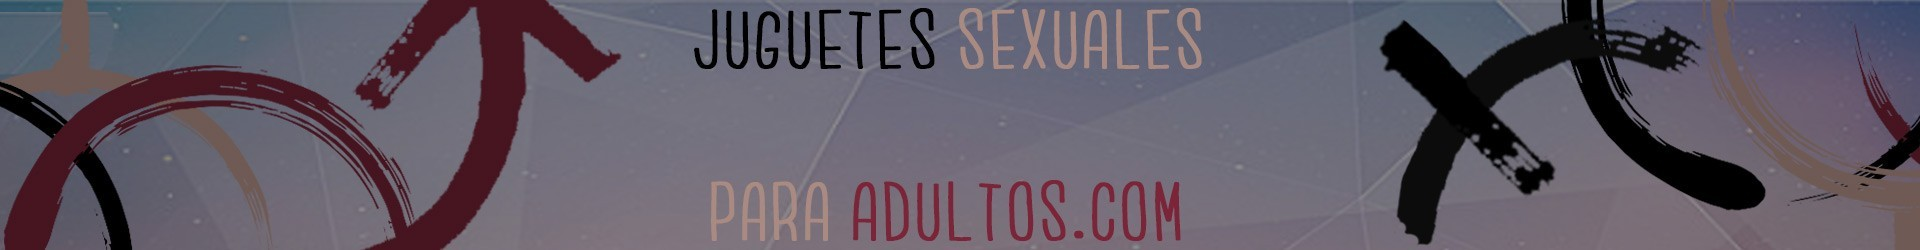 Penes dobles - Juguetes Sexuales para Adultos